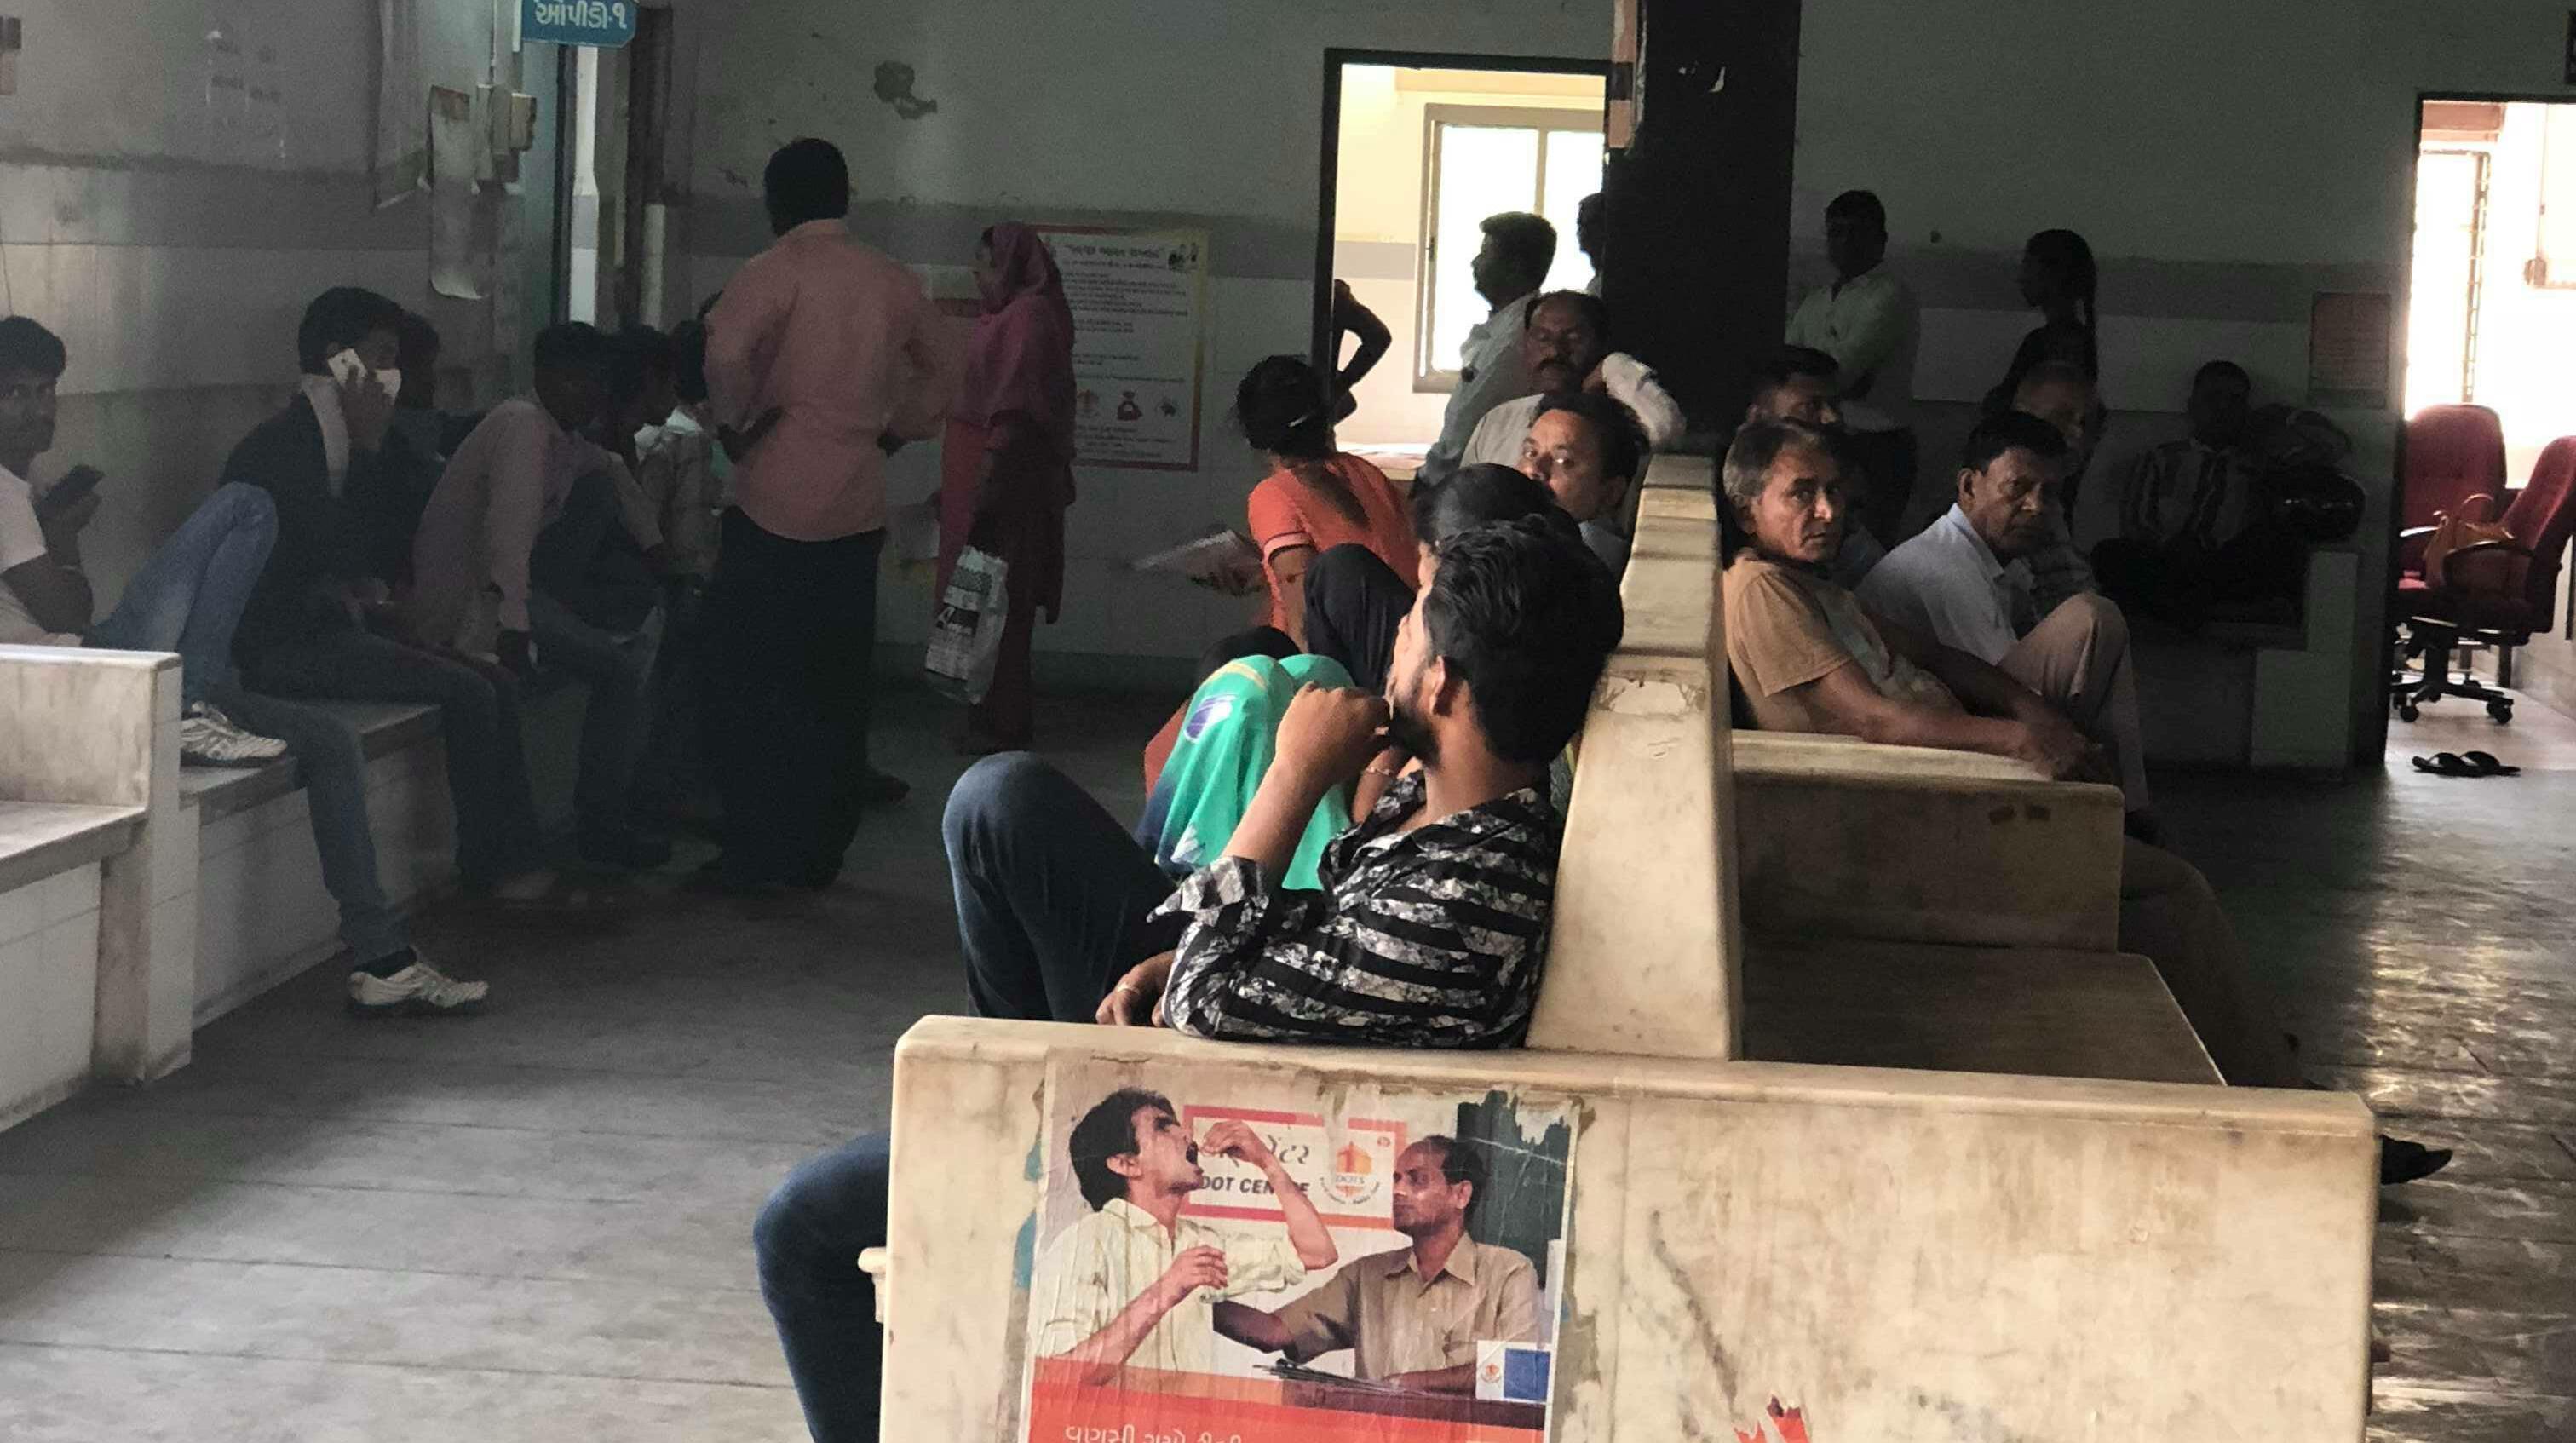 TB waiting room of a hospital in Ahmedabad, India credit Laura Rosu